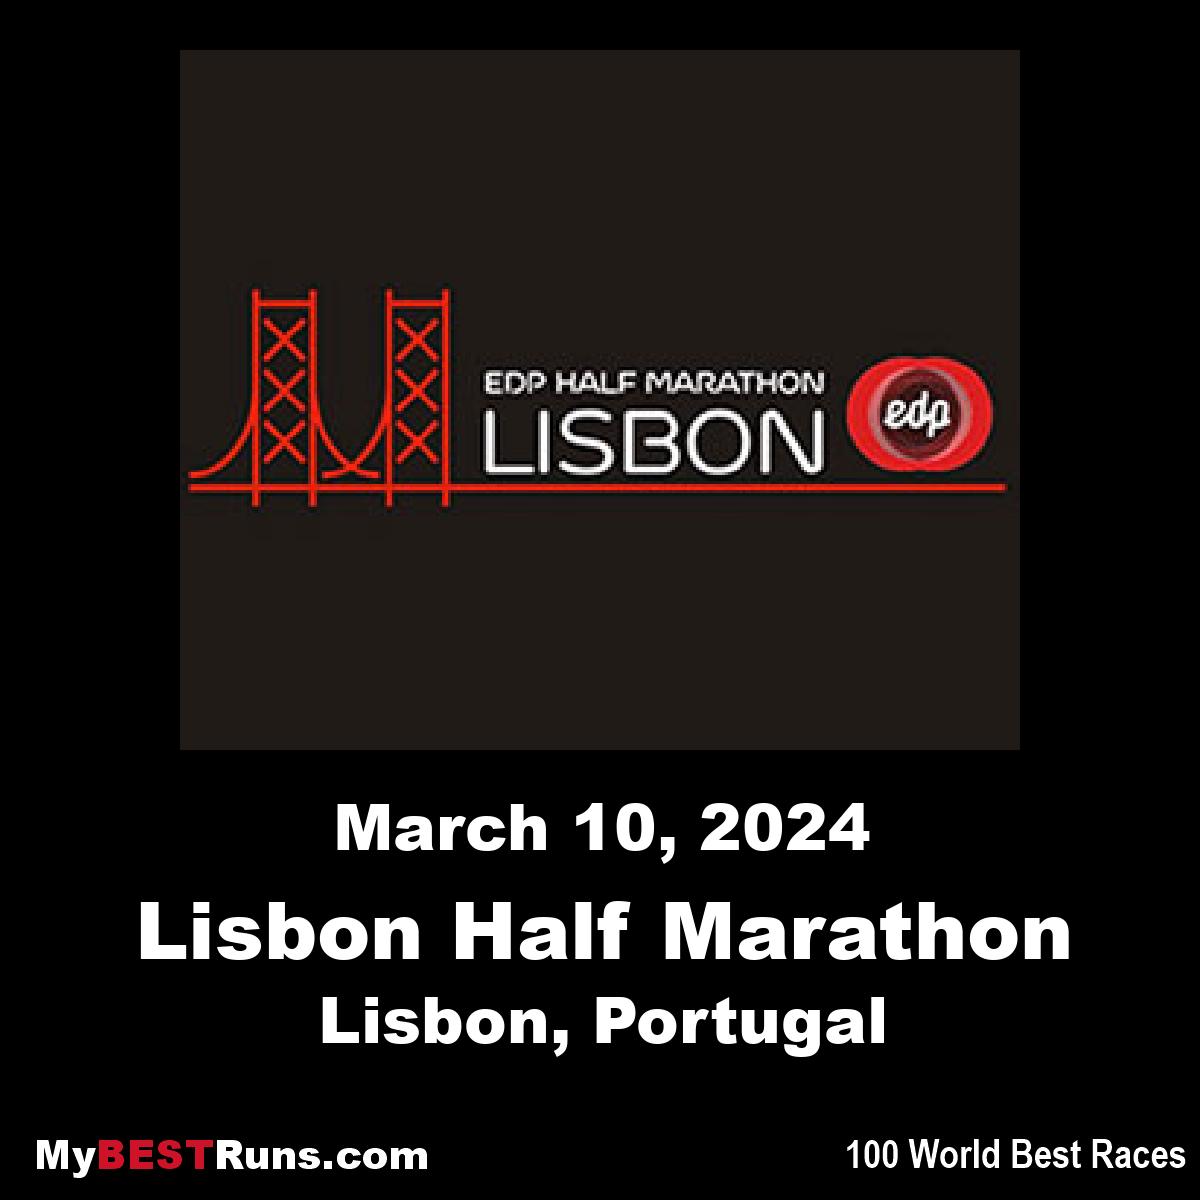 EDP HALF MARATHON OF LISBON